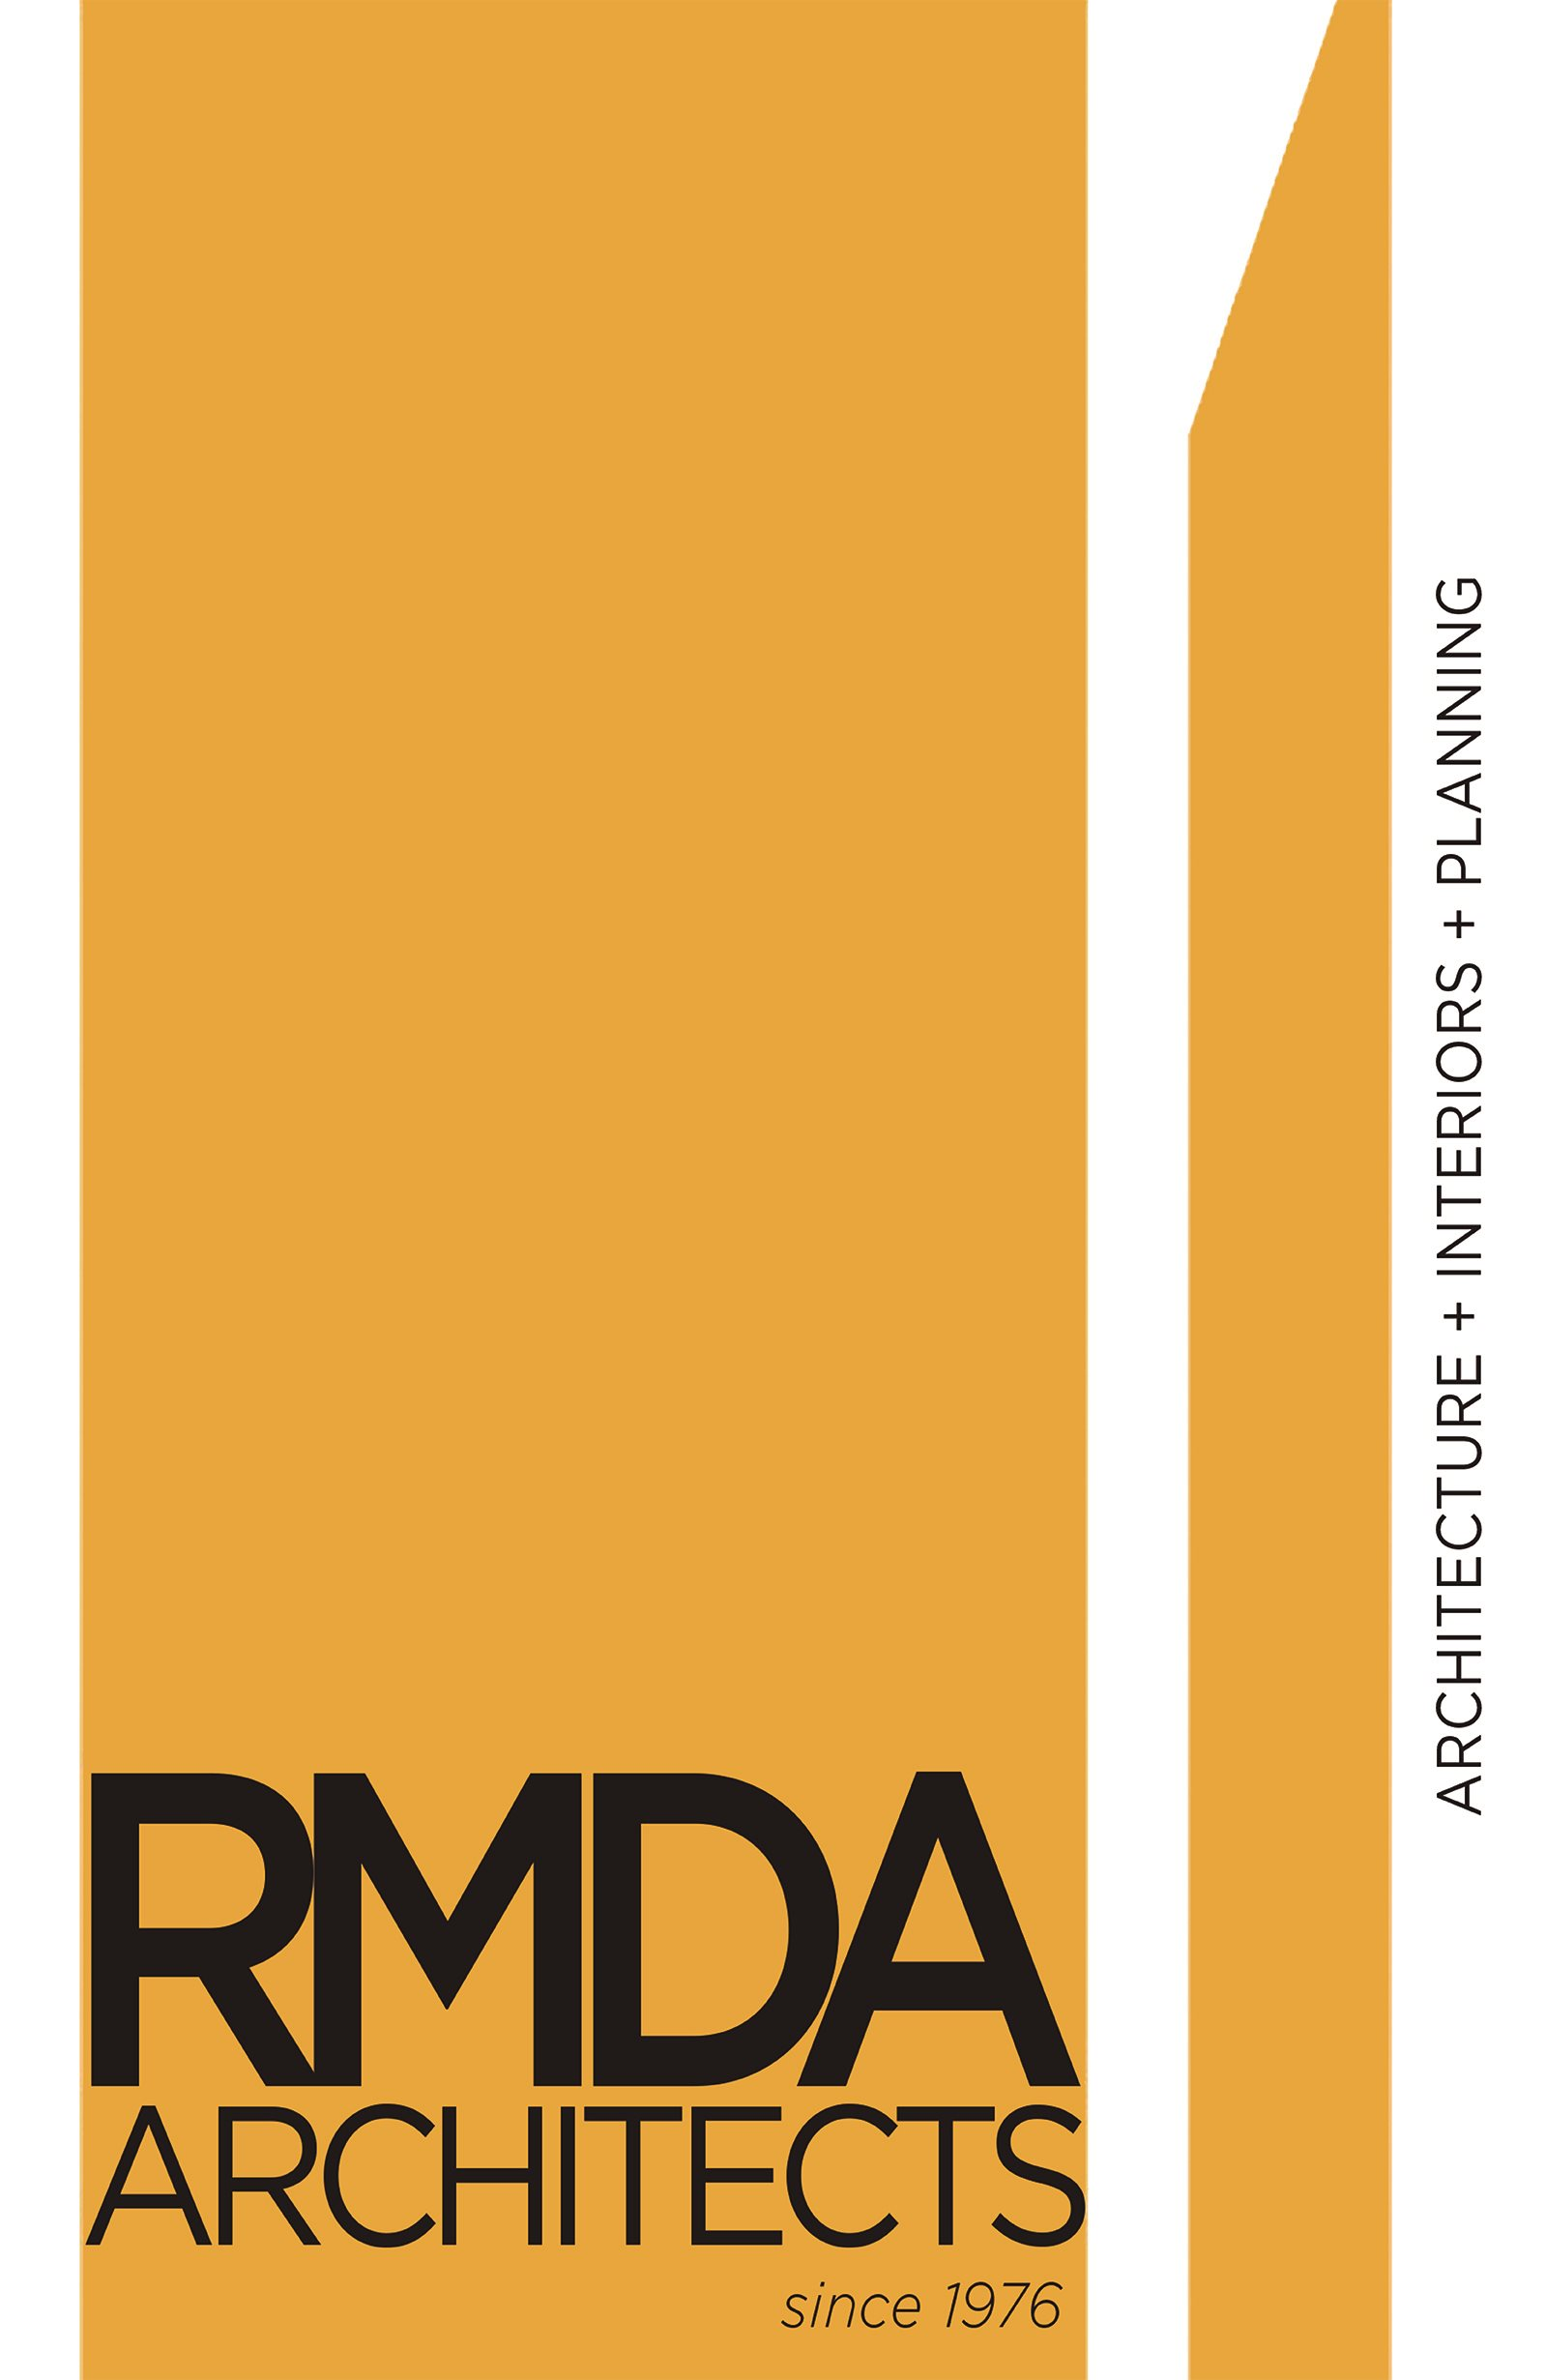 RMDA ARCHITECTS CO.